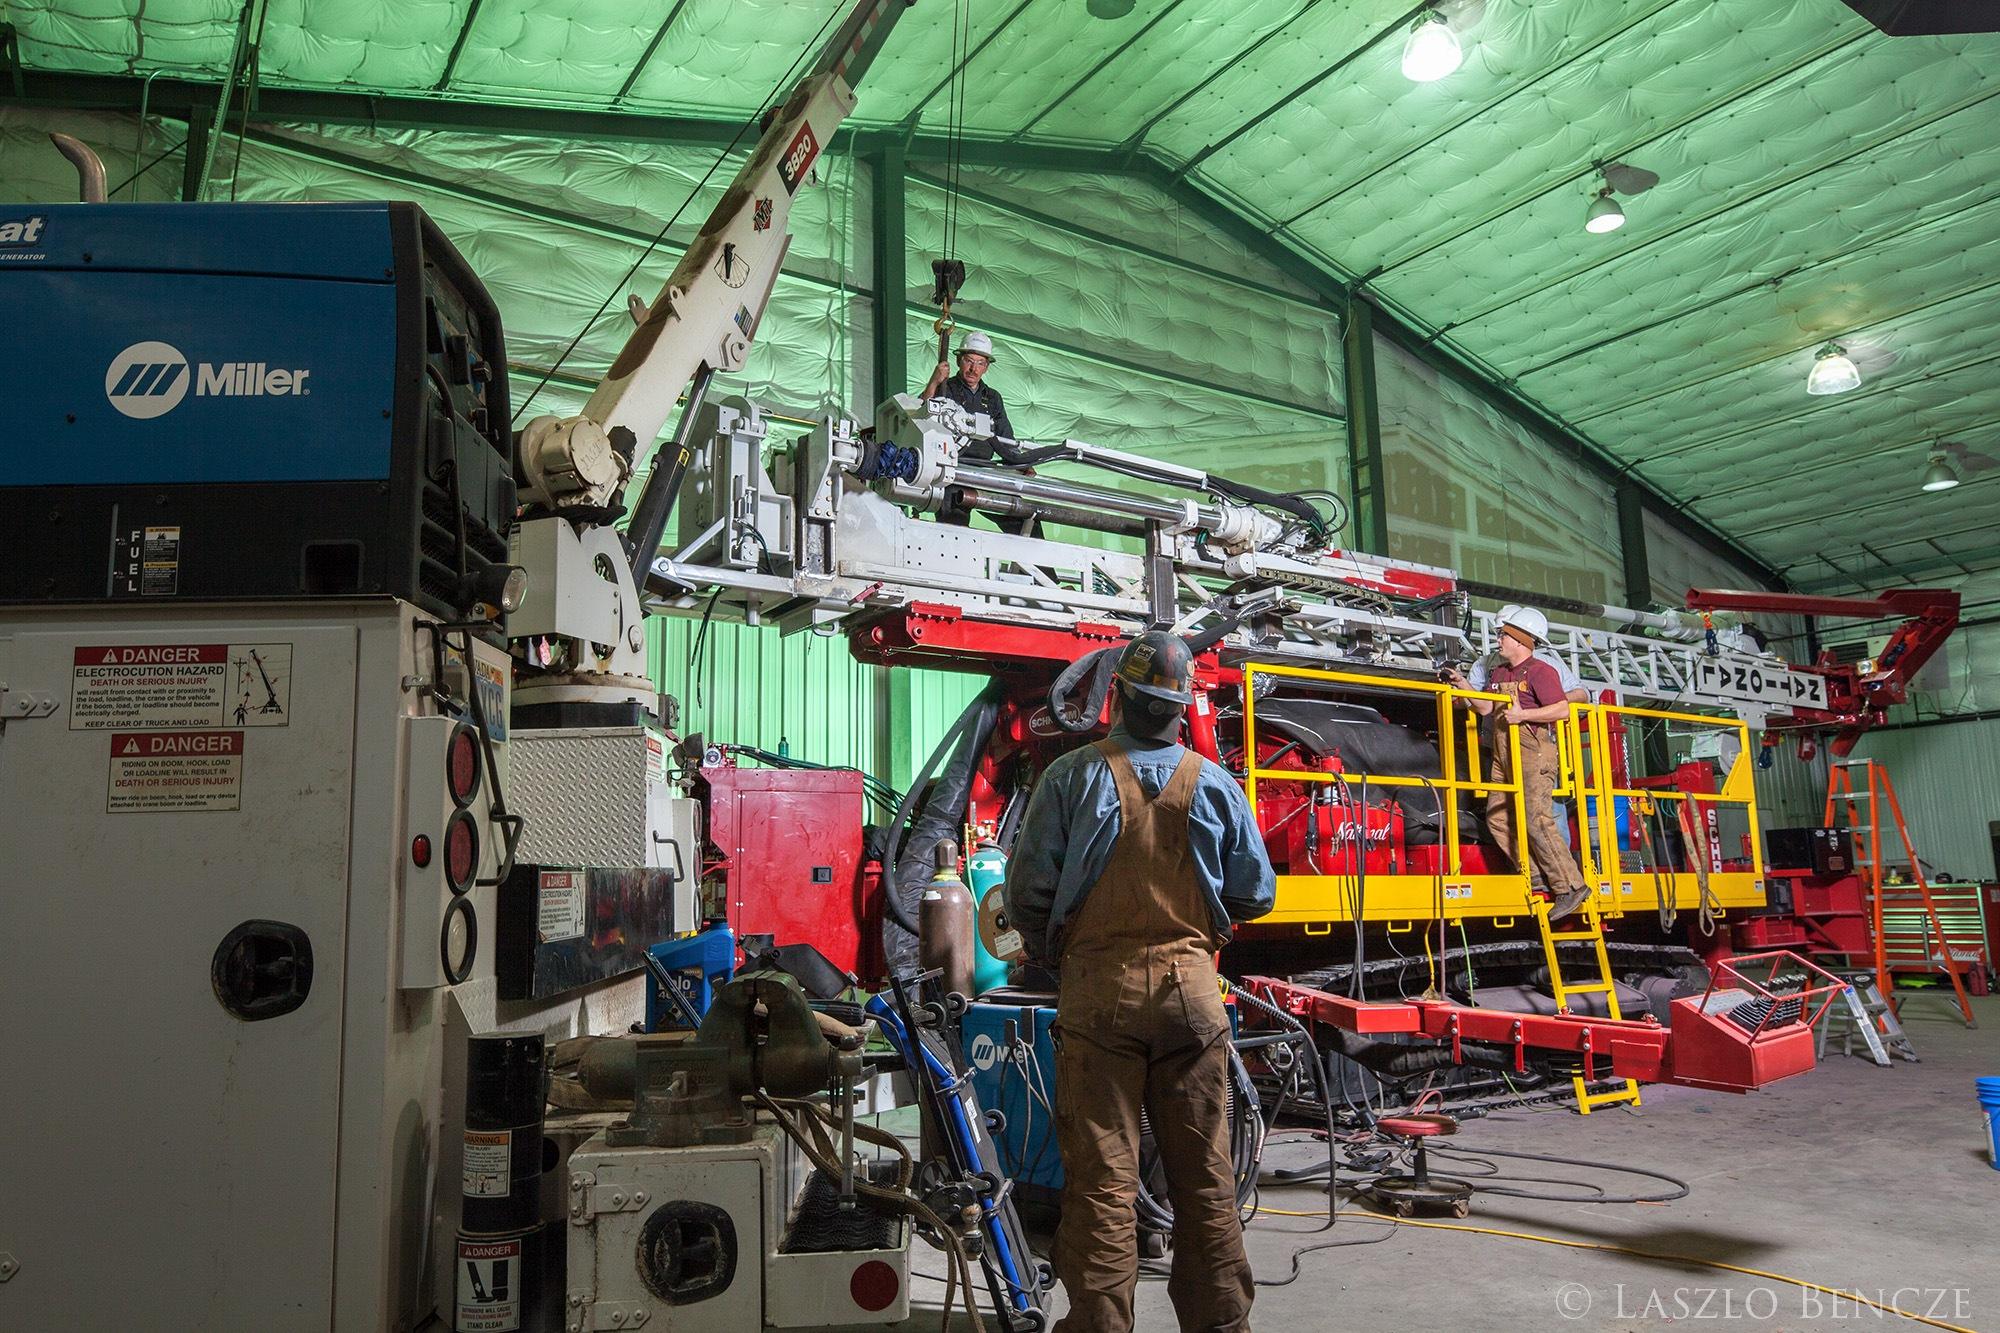 Drill Rig Repair by Laszlo Bencze